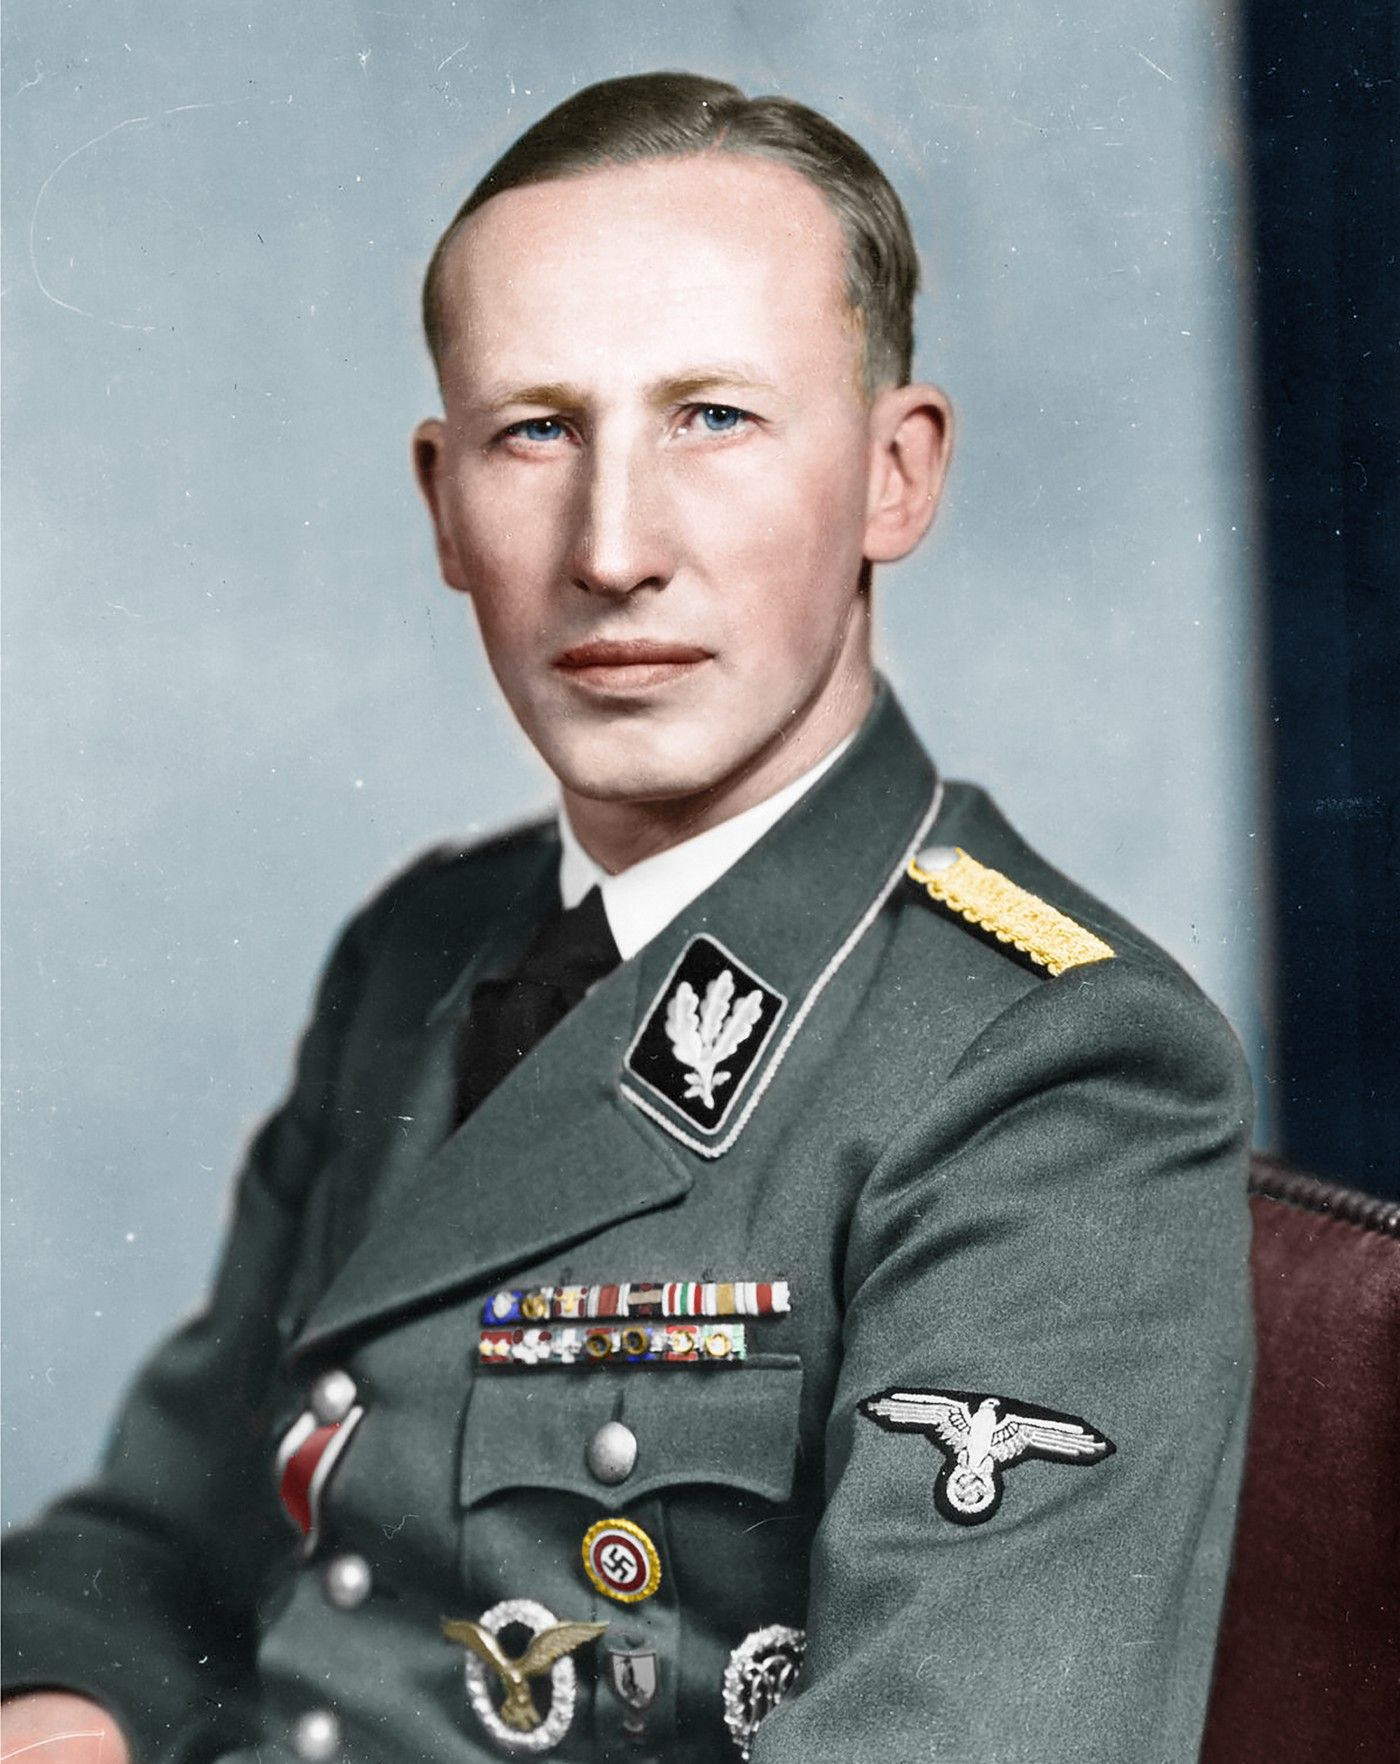 Formalnie Einsatzkommando Paulsen podlegało samemu Reinhardowi Heydrichowi.